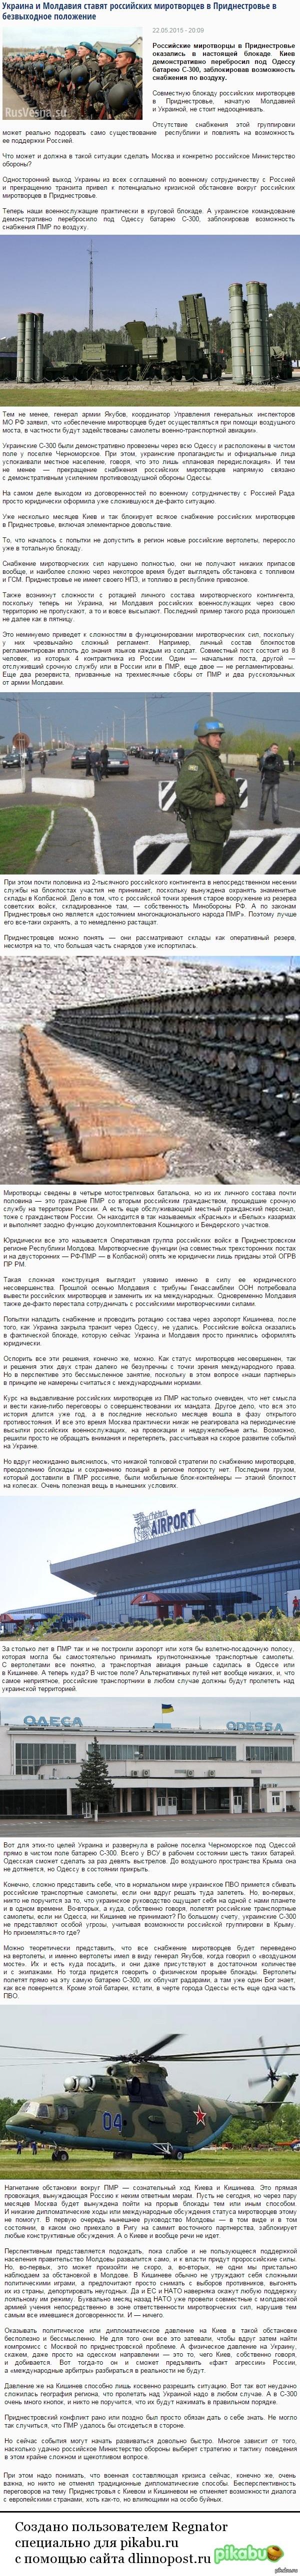 Ситуация в Приднестровье Источник:  http://www.vz.ru/world/2015/5/22/746862.html